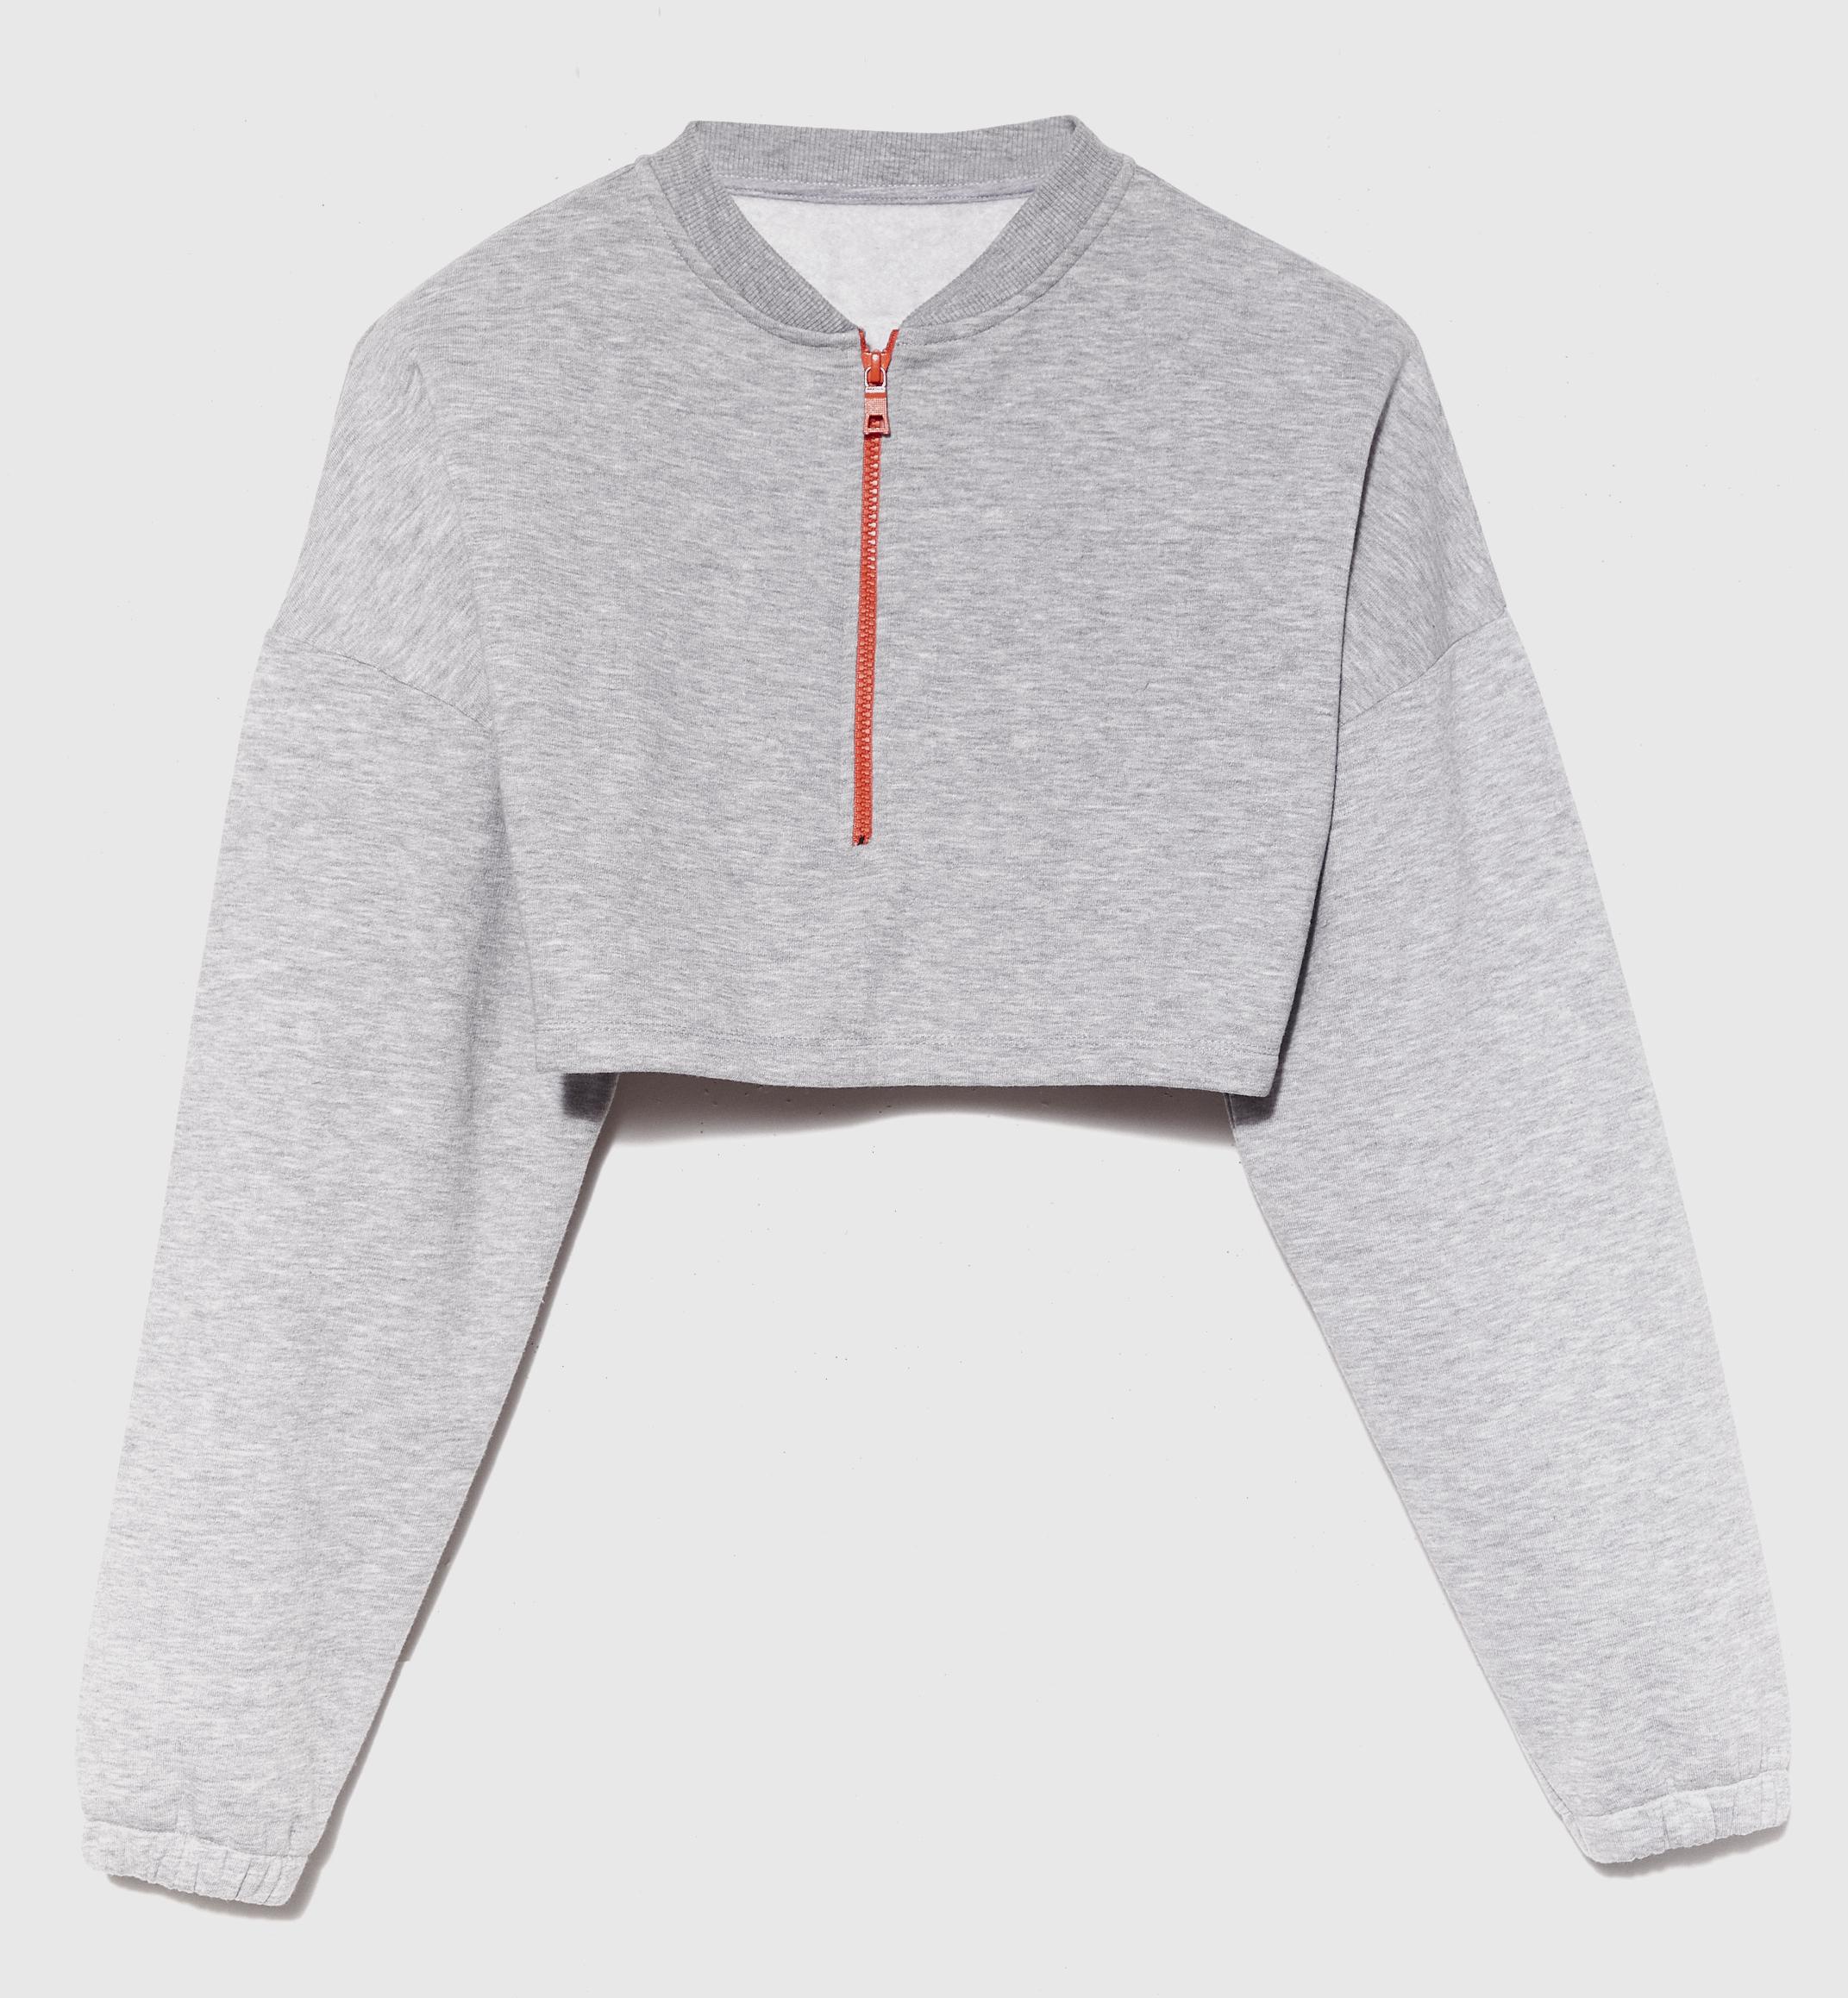 Nasty Gal Sweatshirt